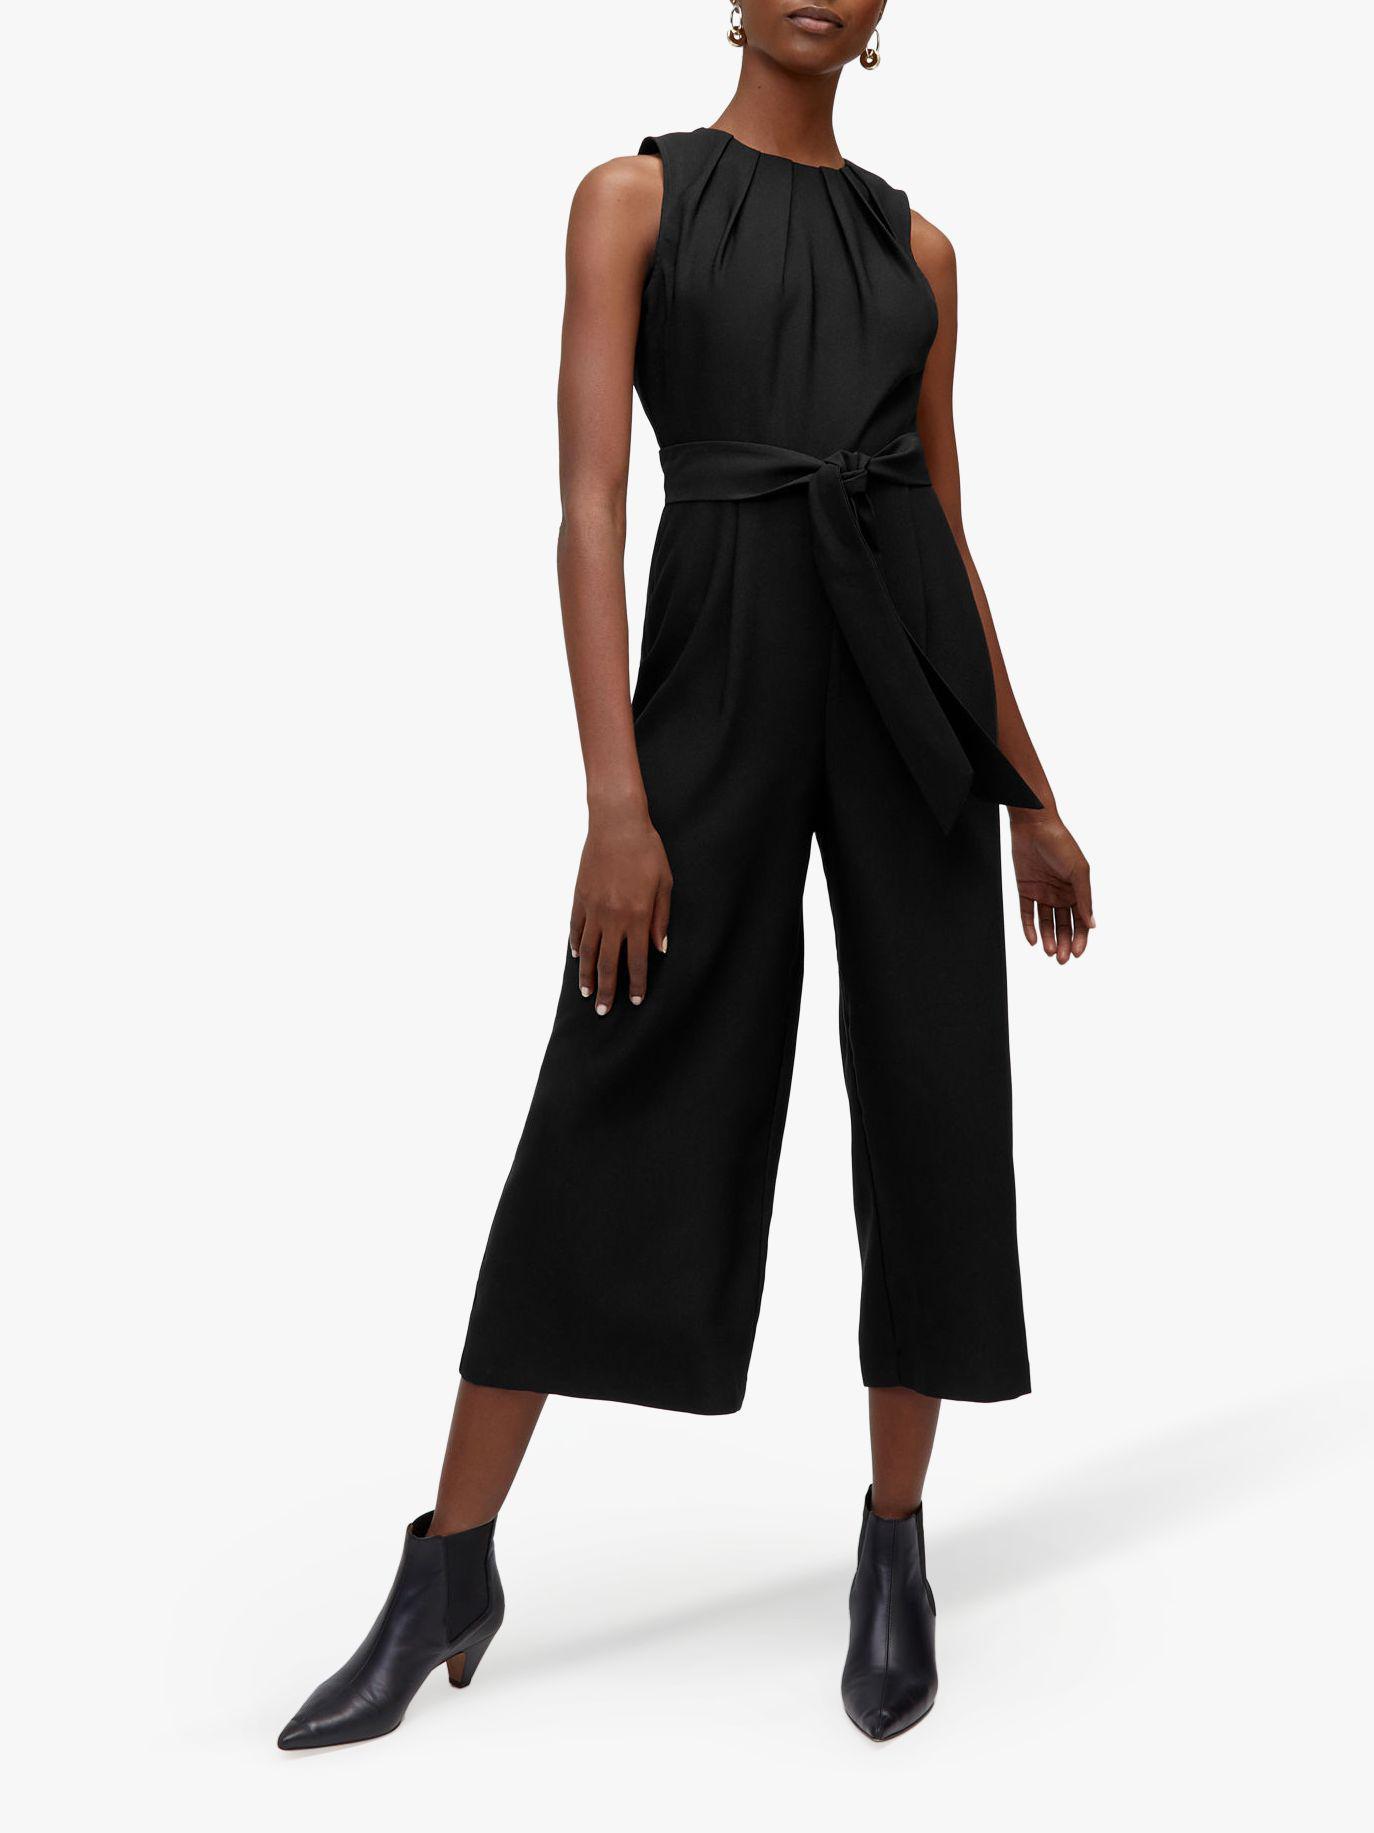 c7e695ee42b3 Warehouse Gathered Tie Waist Jumpsuit in Black - Lyst